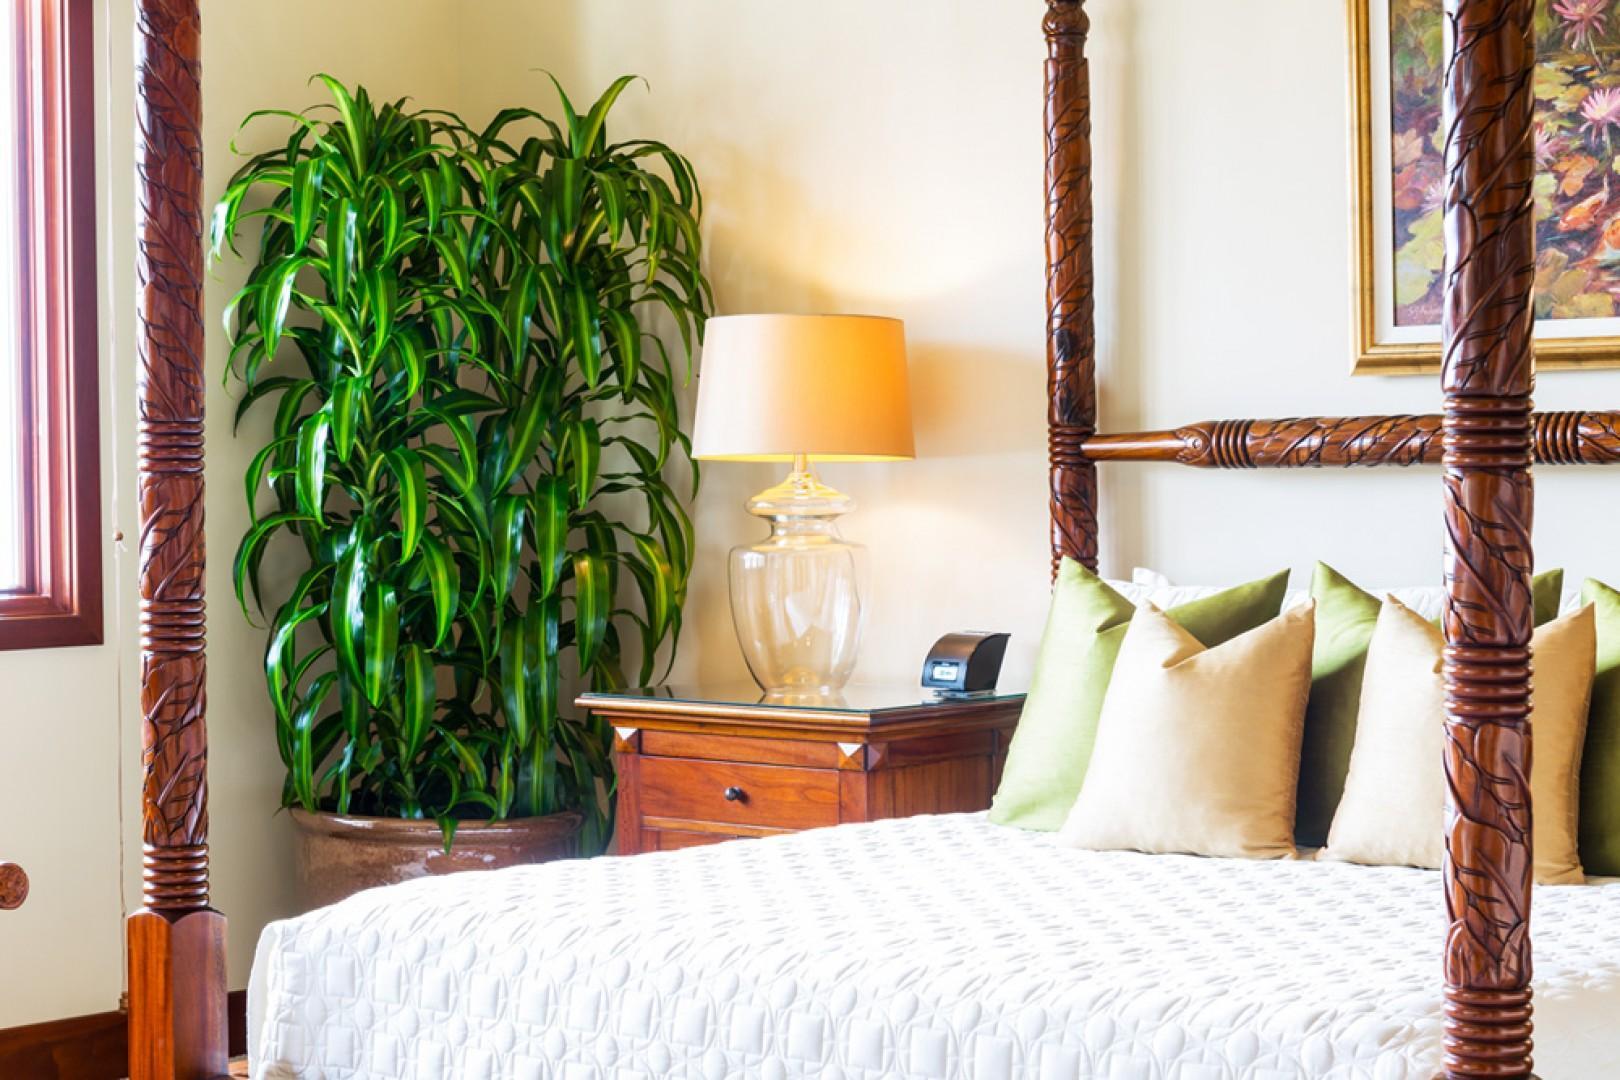 L509 Sandcastles Suite Ocean View King Master Bedroom with Private En-Suite Bath Opens to the Alfresco Veranda